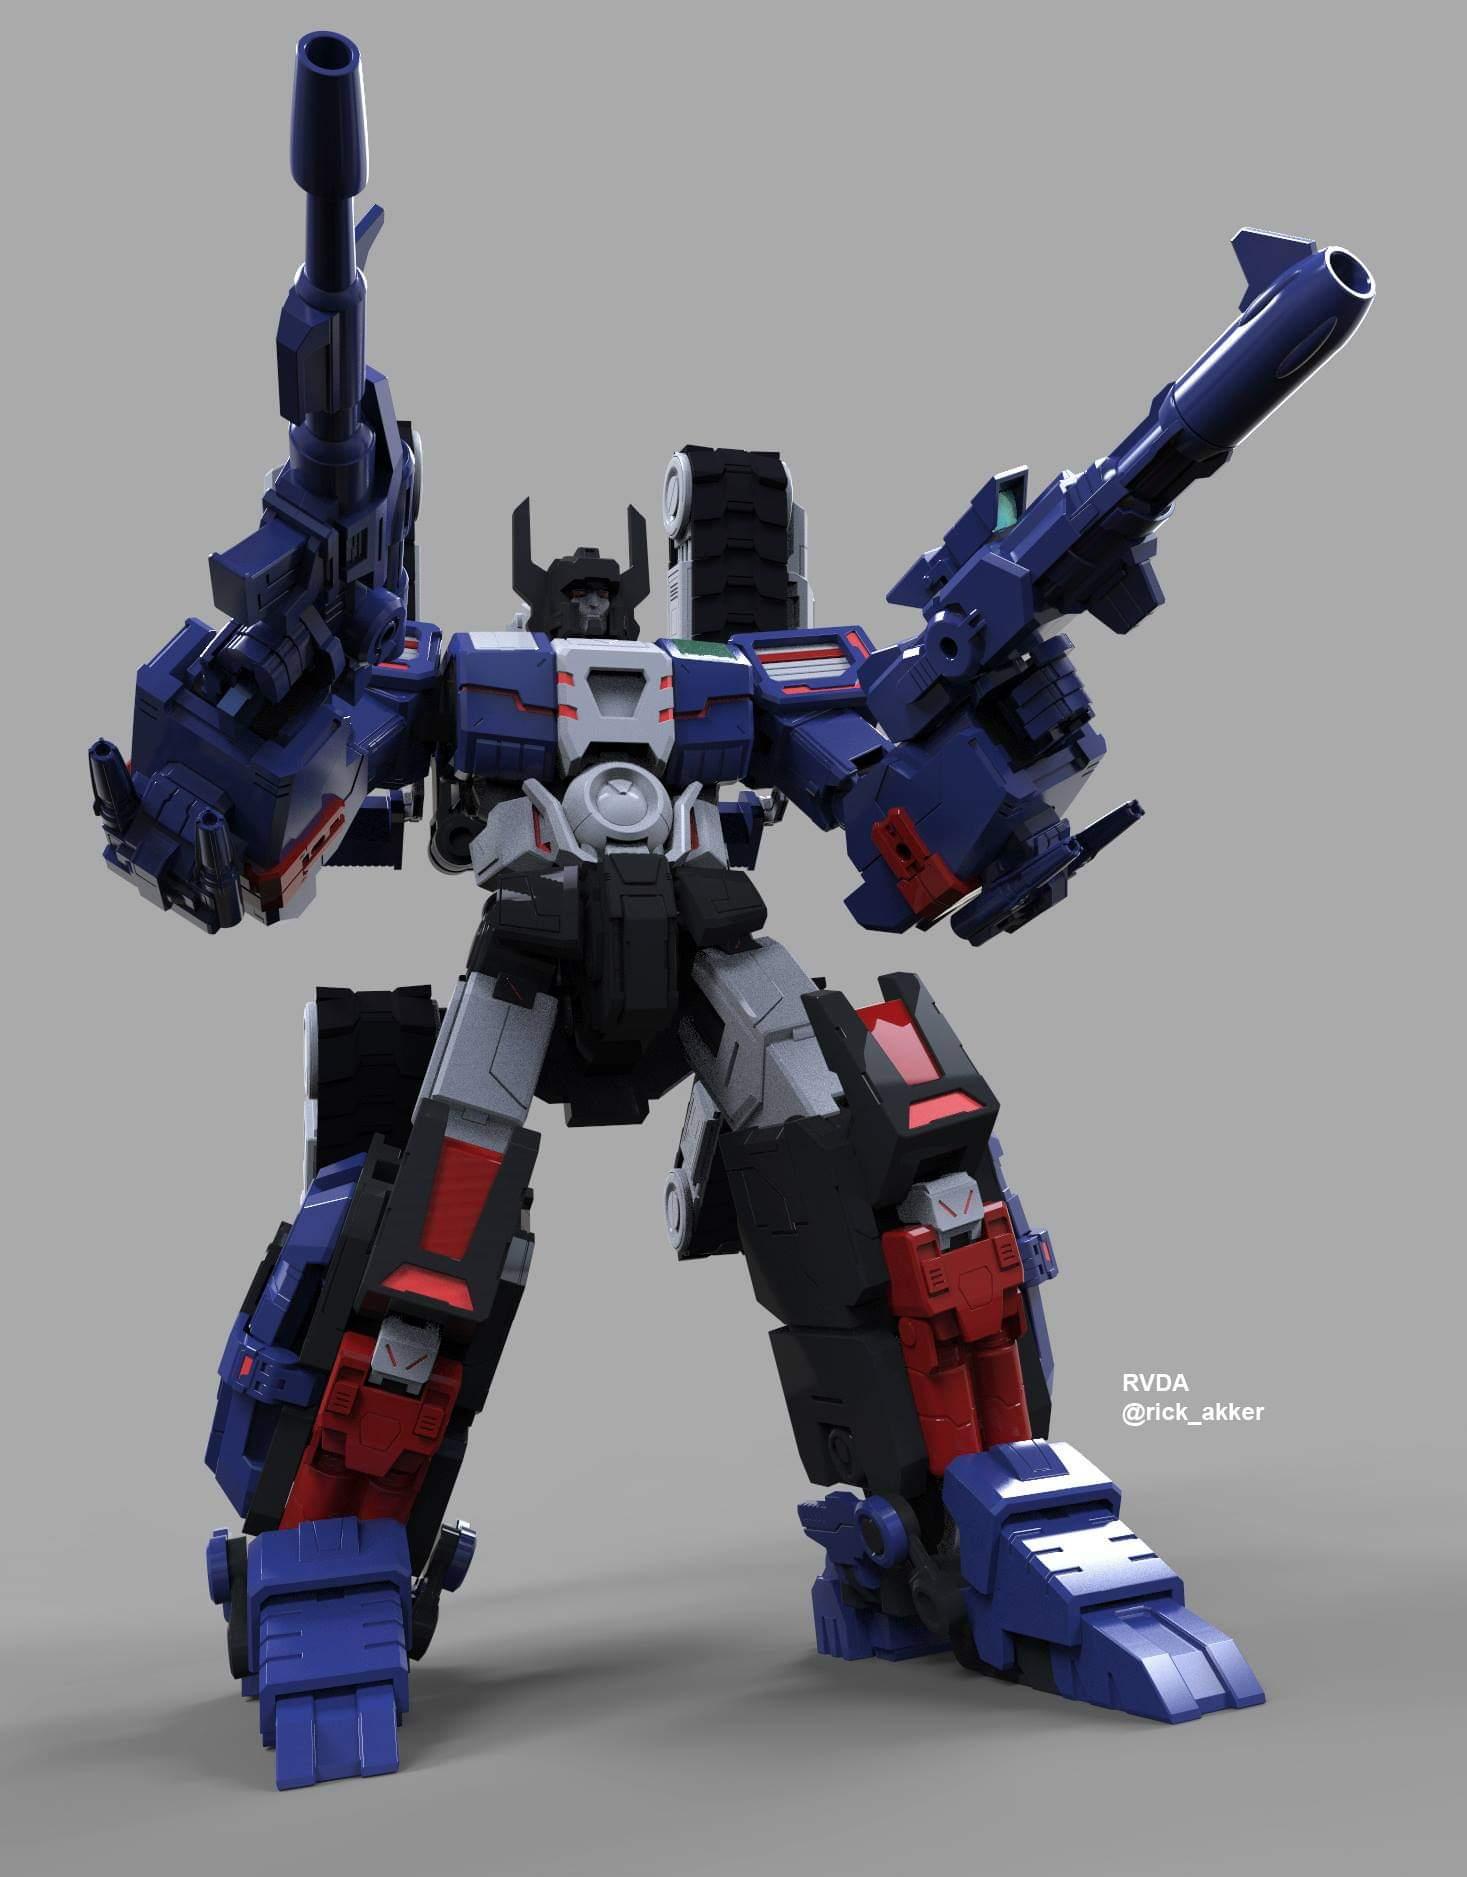 [Mastermind Creations] Produit Tiers - Reformatted R-50 Supermax - aka Fortress/Forteresse Maximus des BD IDW Ukfg3Bkt_o